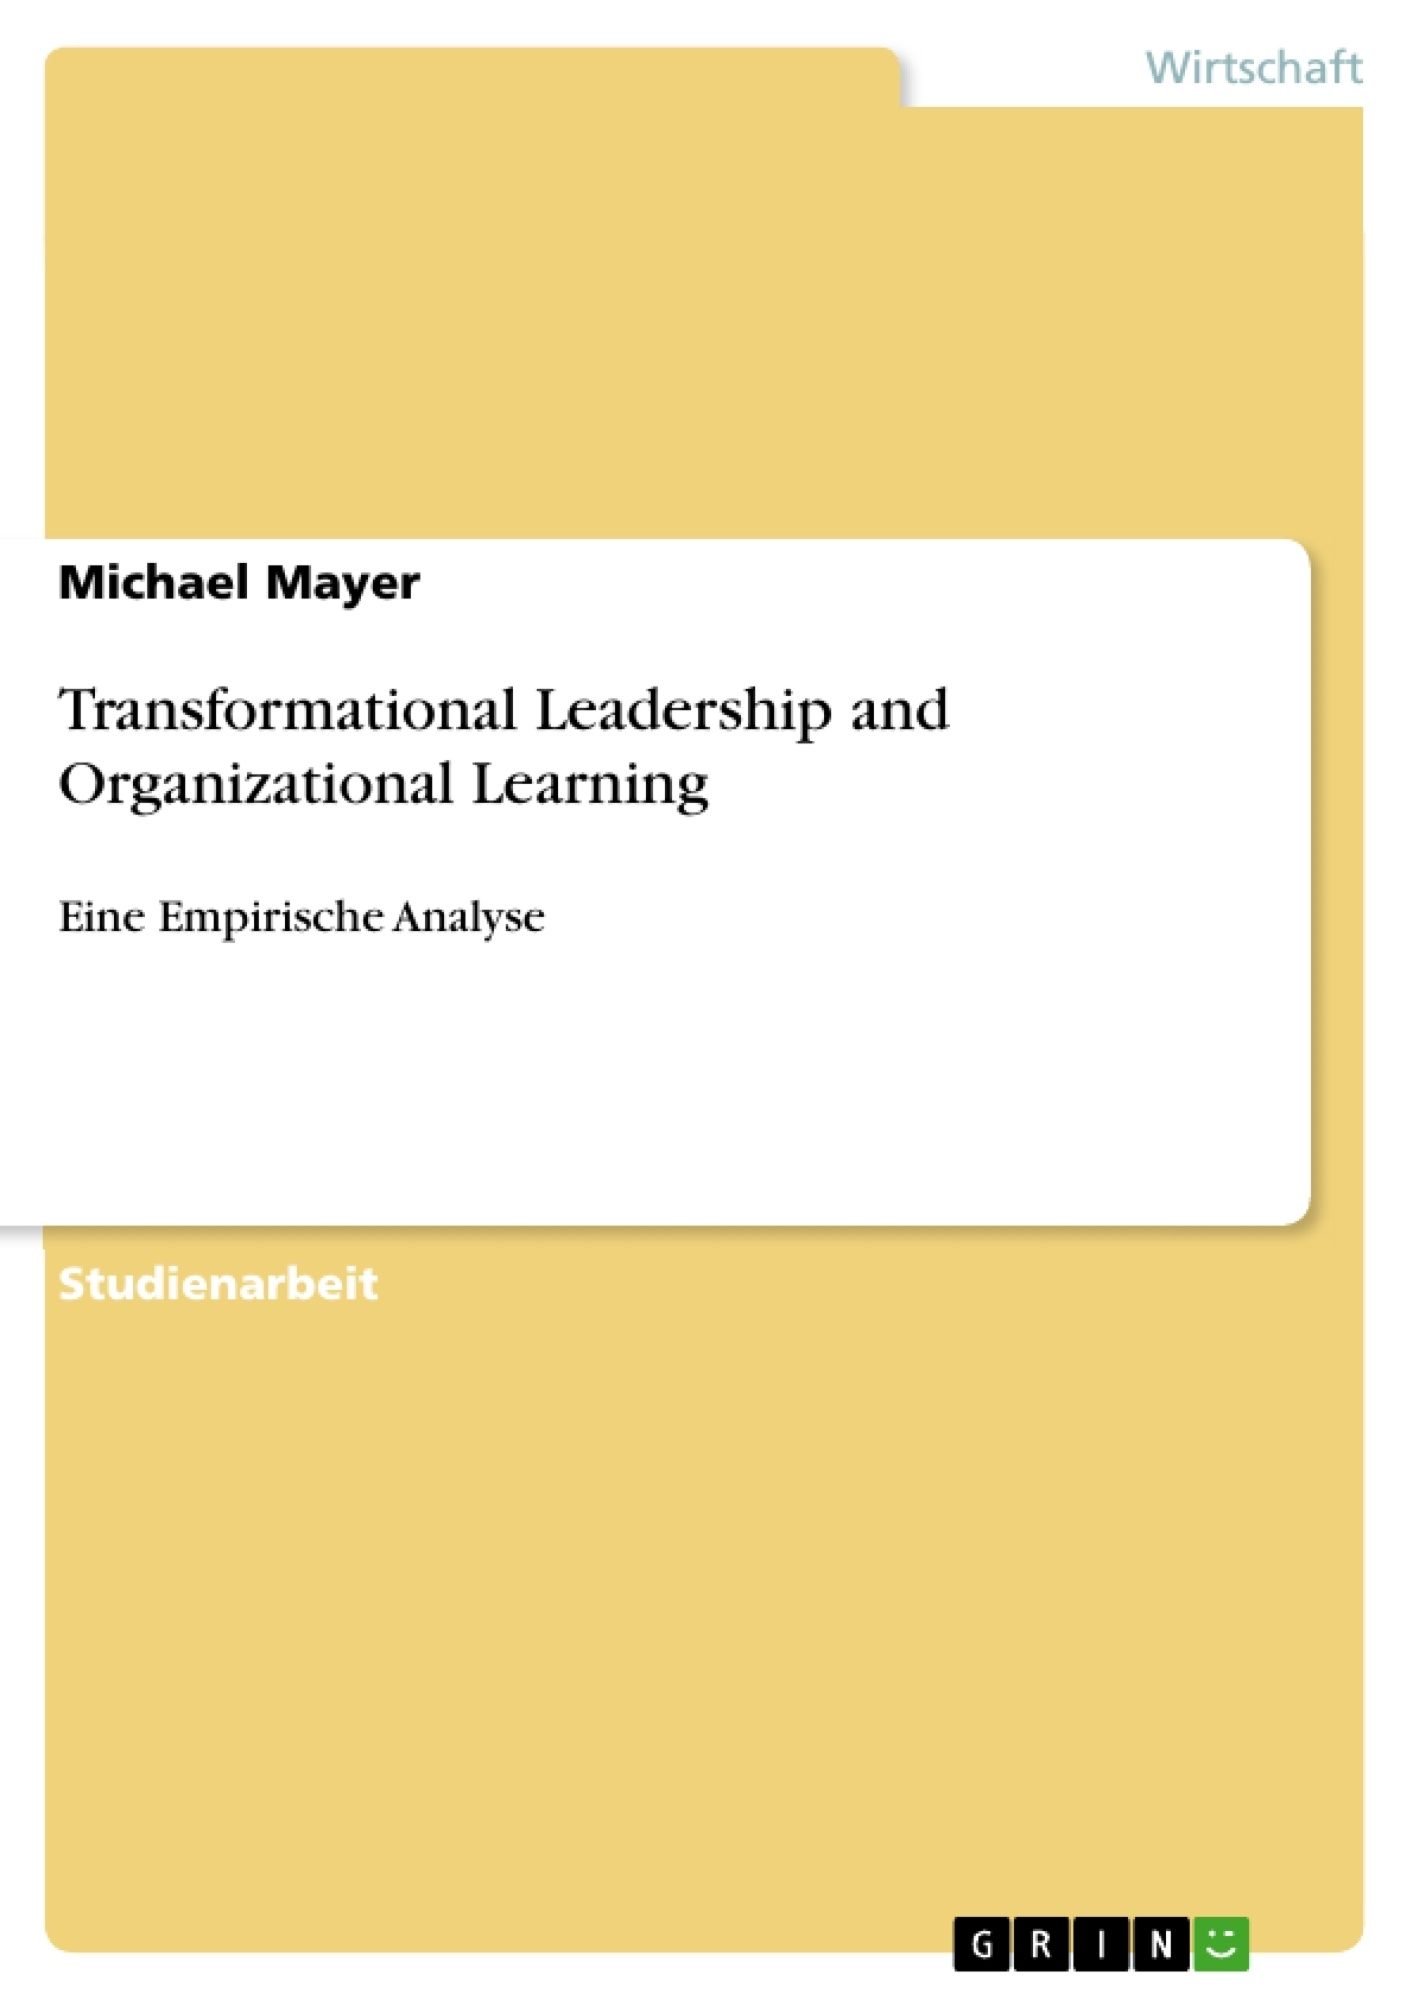 Titel: Transformational Leadership and Organizational Learning